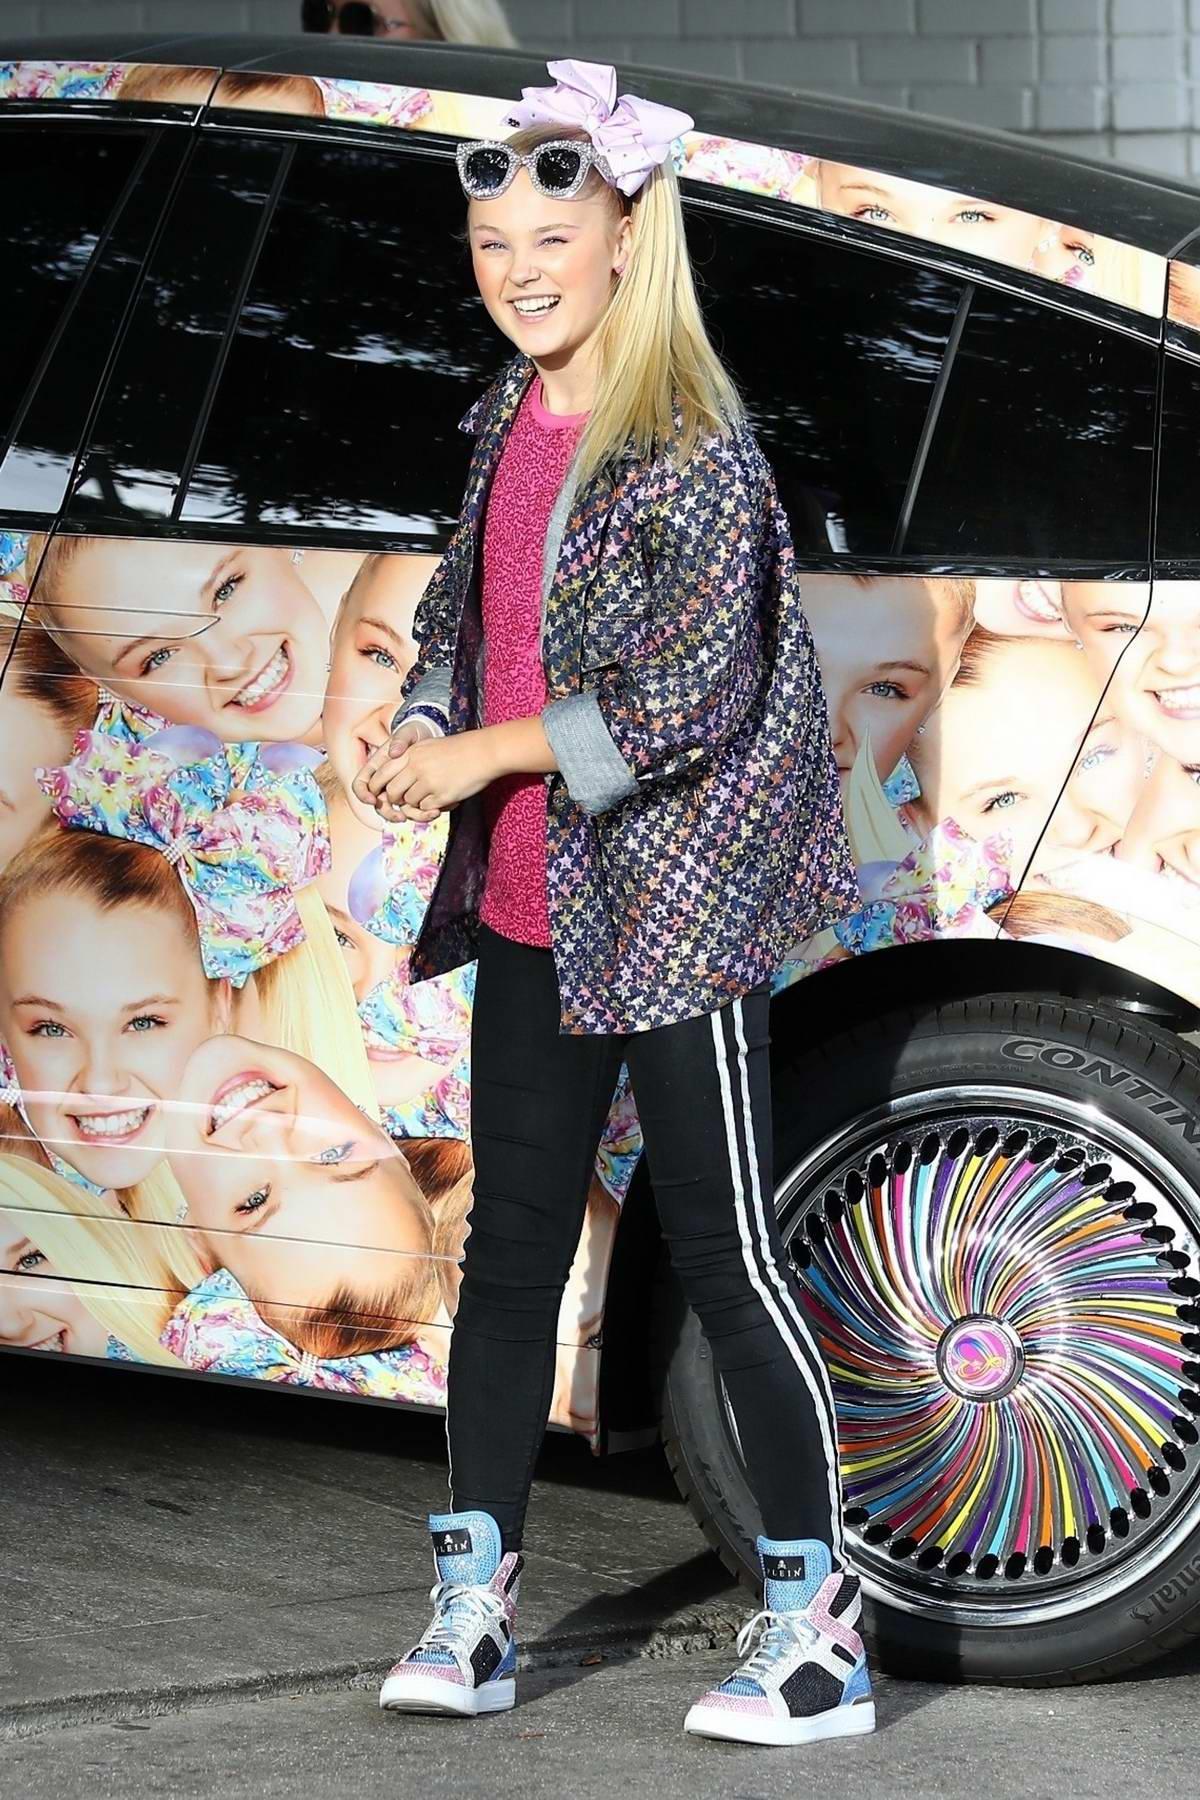 JoJo Siwa seen with her custom wrapped Tesla Model X in Los Angeles